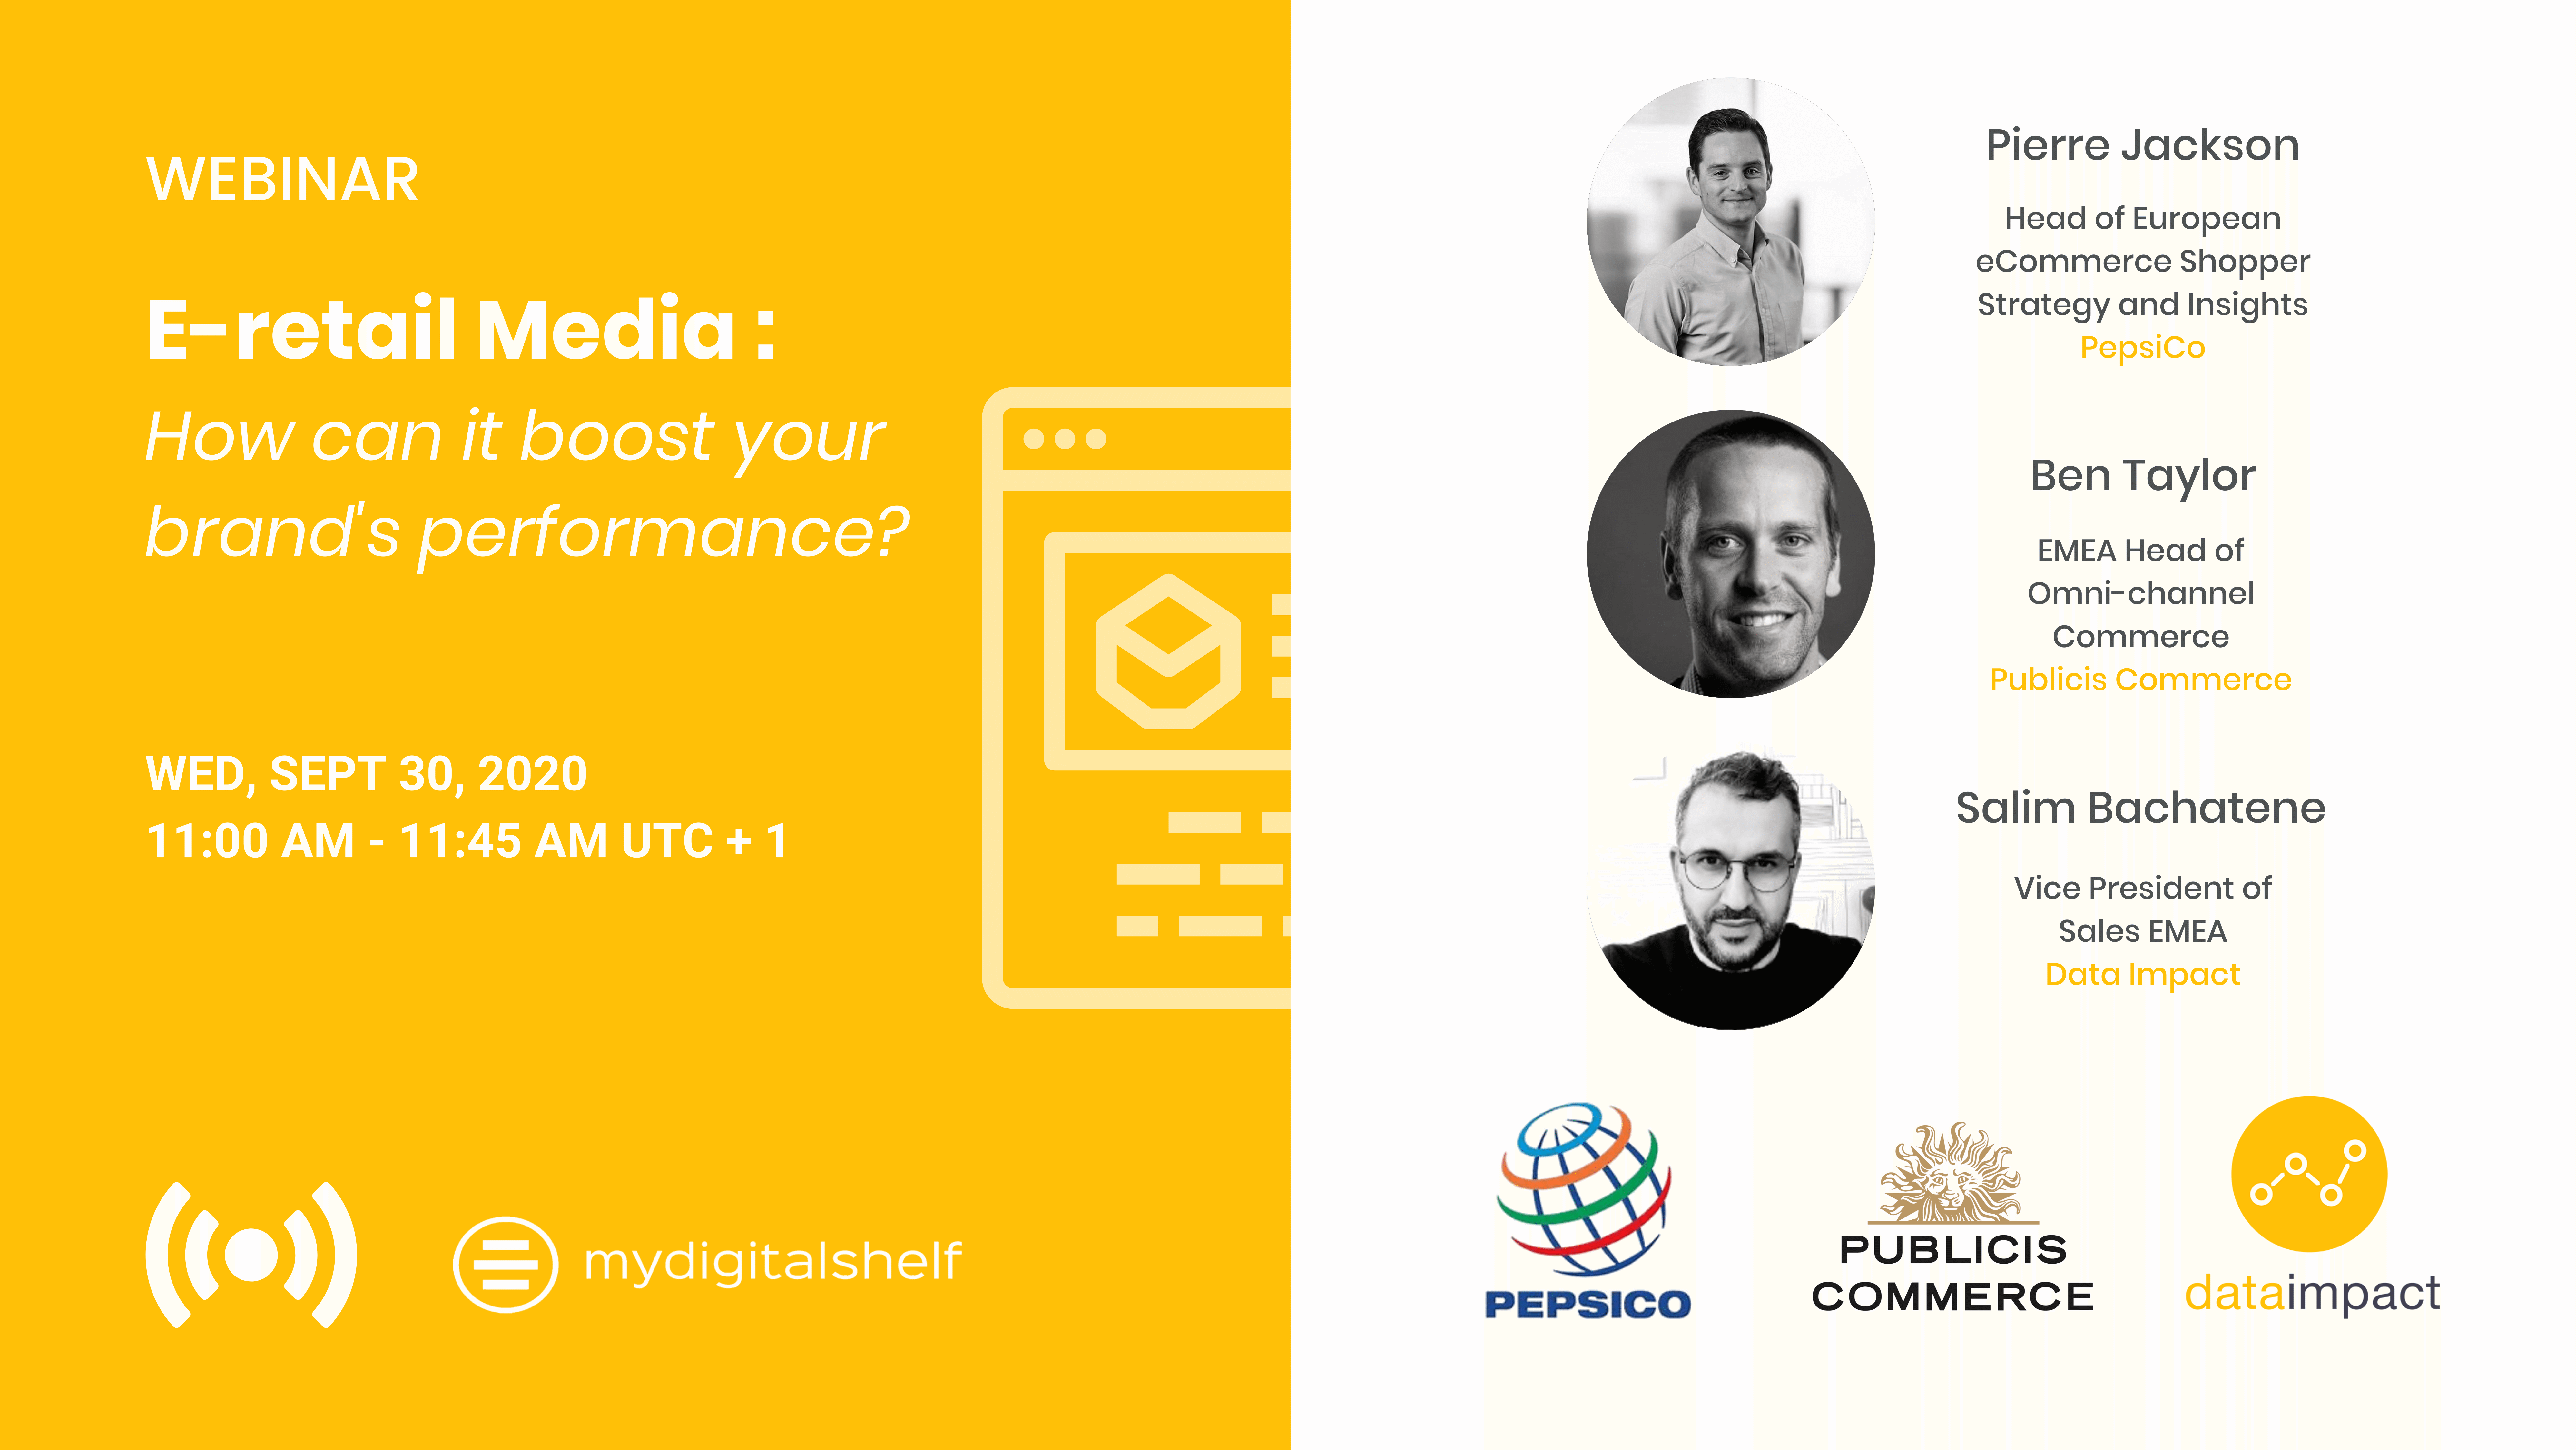 Webinar-PepsiCo-Publicis Commerce-Data Impact-E-retail-performance-Omnichannel